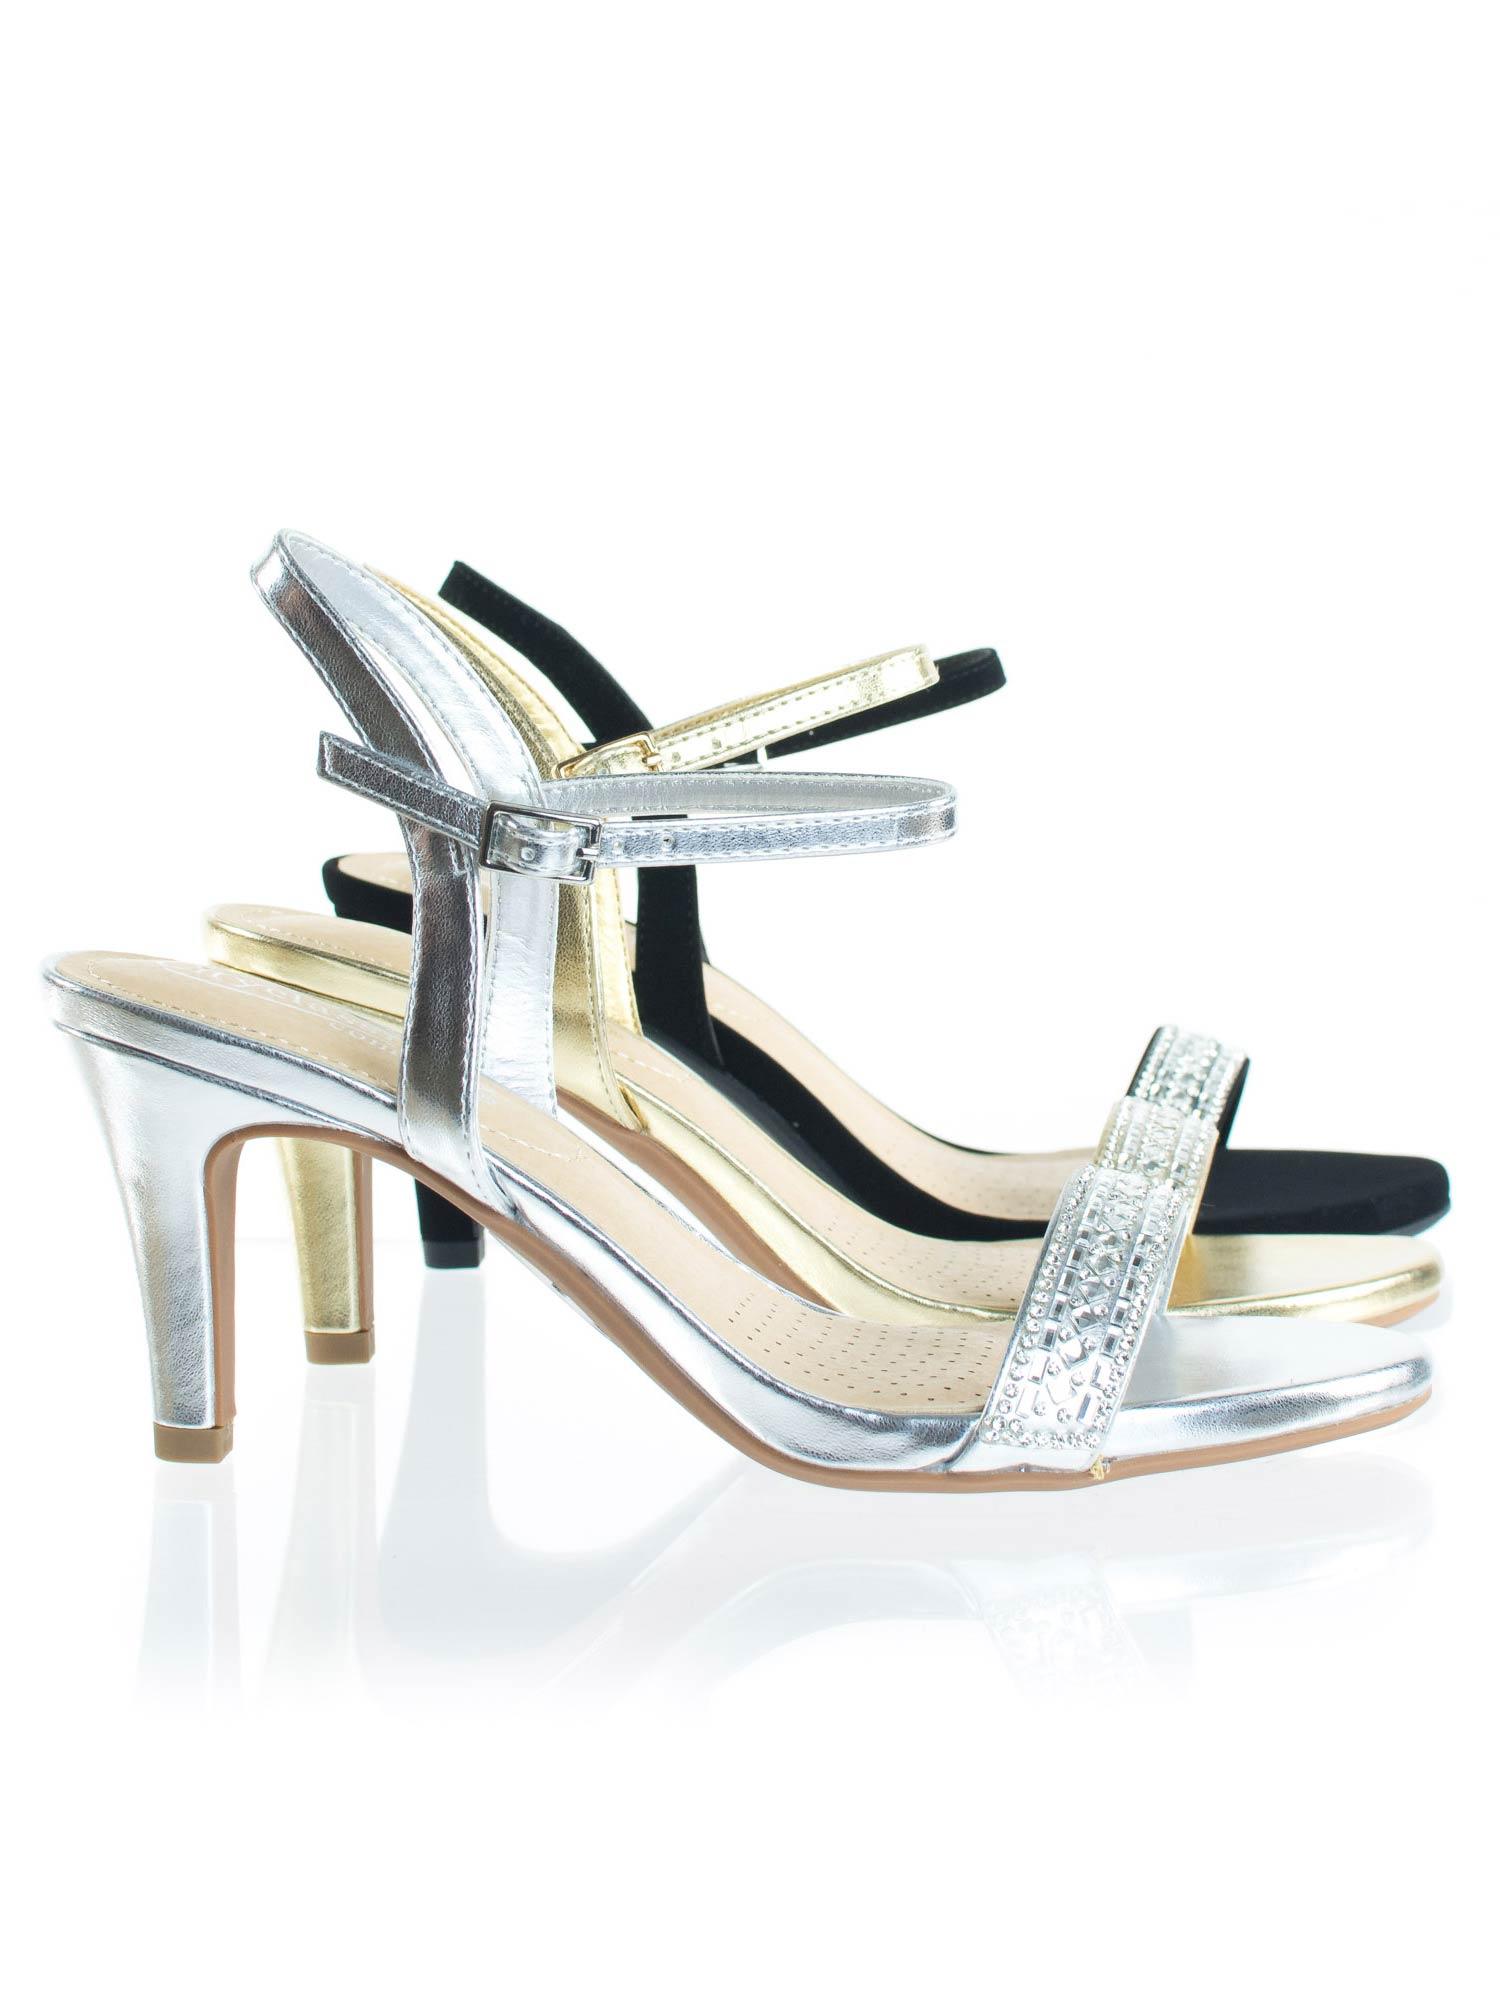 Grant by City Classified, Rhinestone Crystal High Heel Dress Sandal w Comfortable Foam Padding